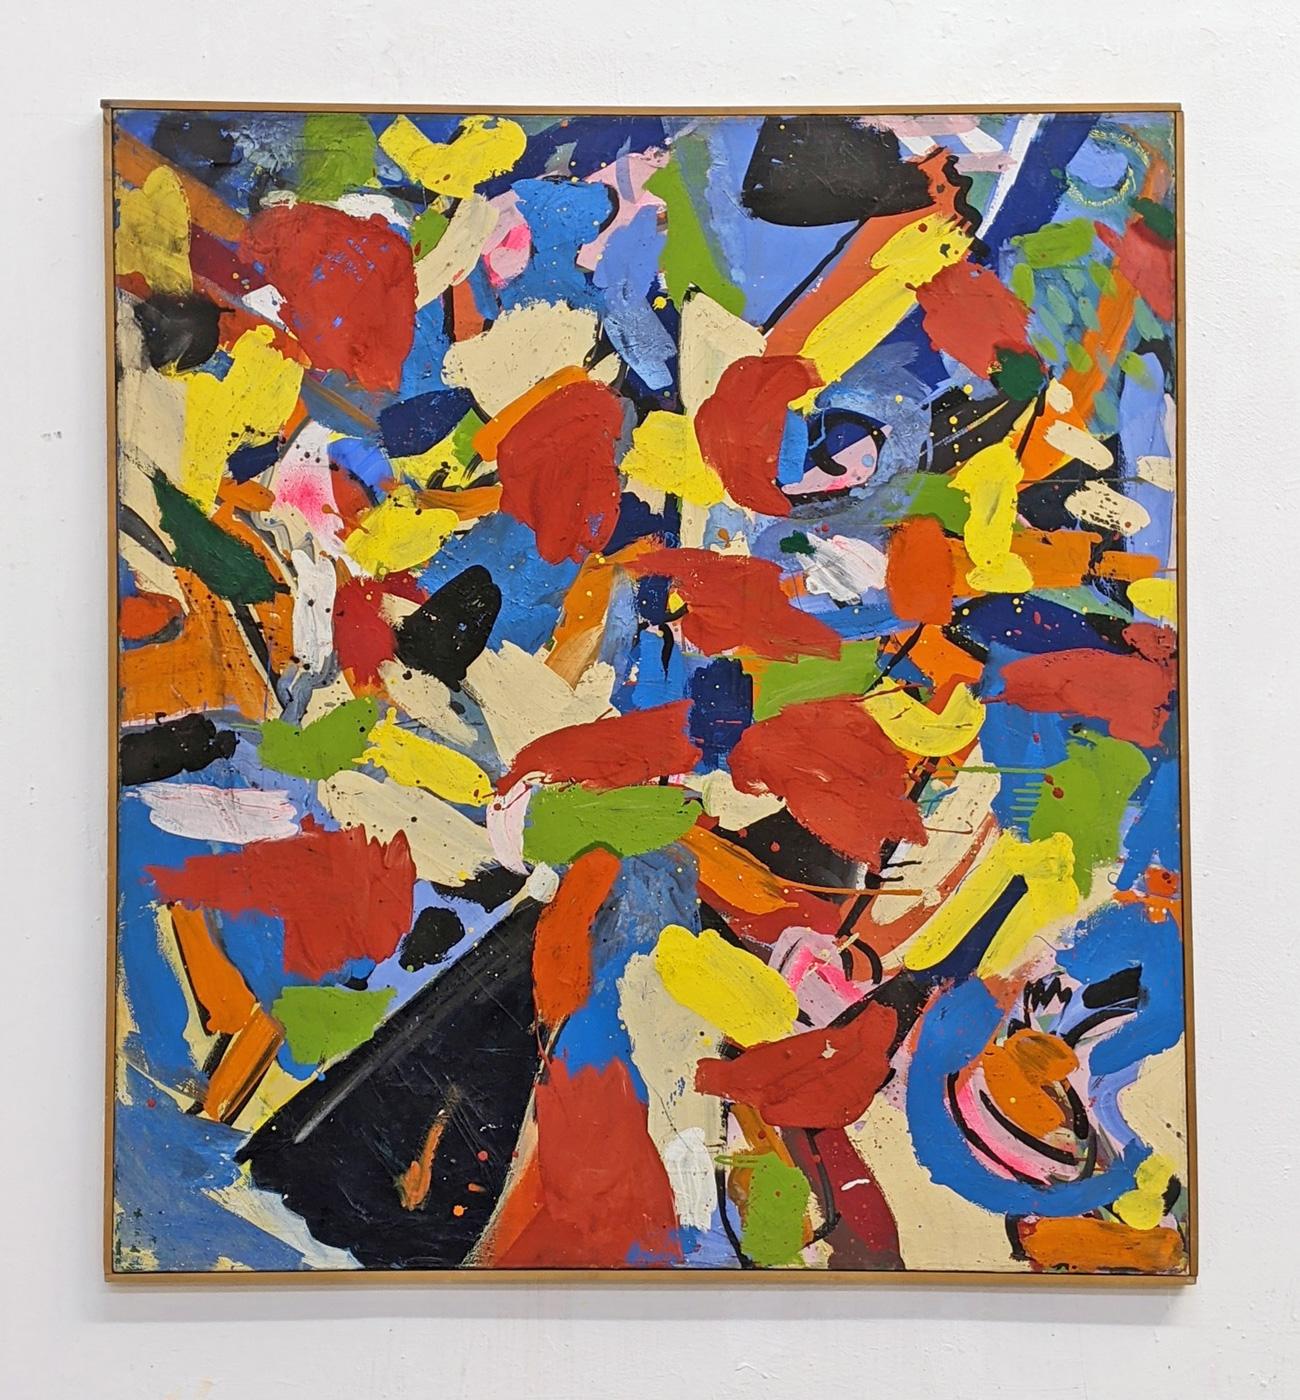 """Schweben"", 120 x 110 cm, Acrylfarbe, Nessel, 1985"